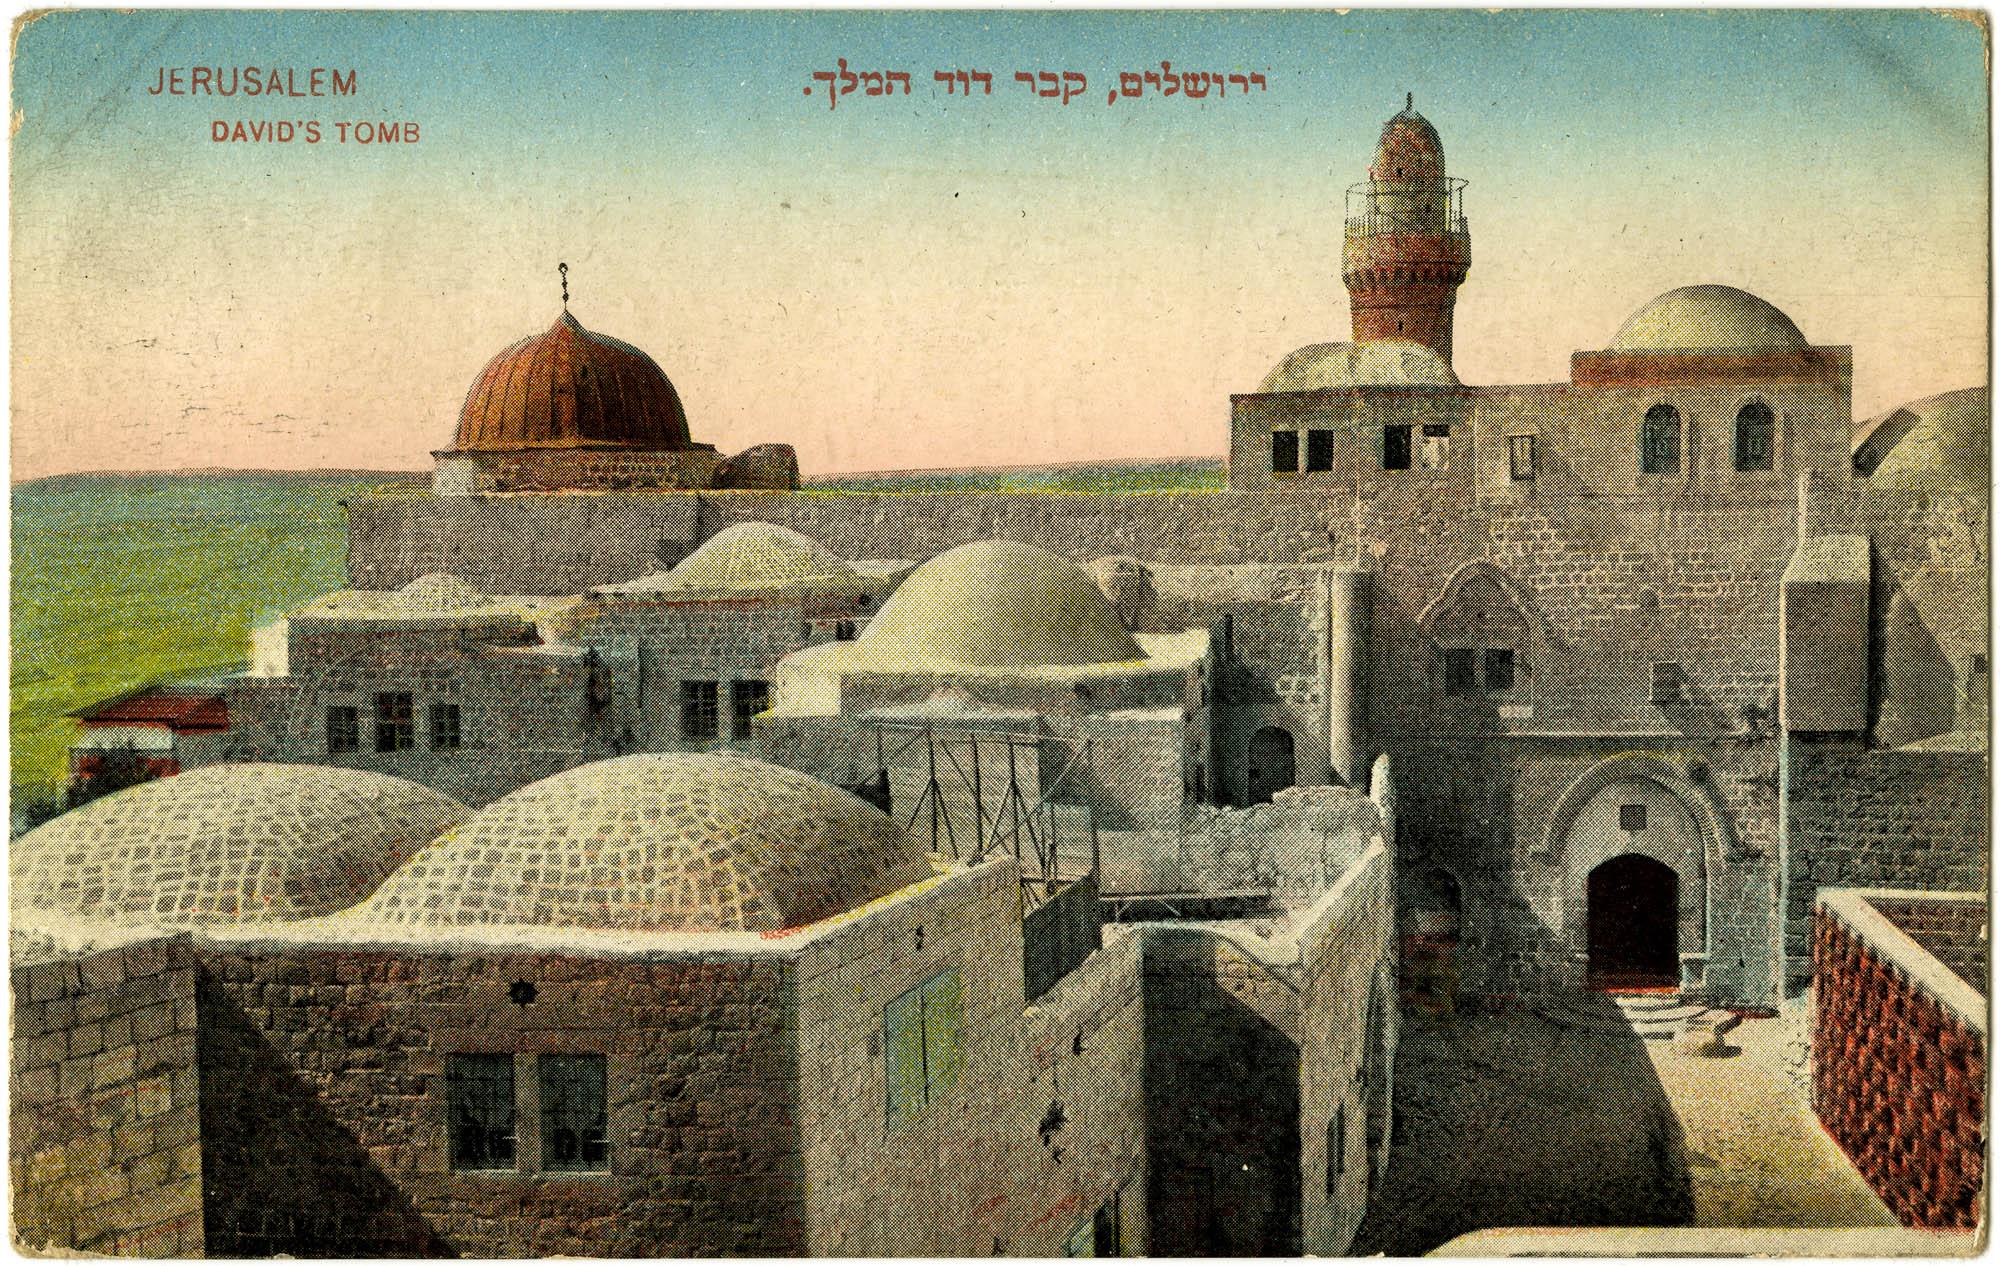 Jerusalem, David's Tomb / ירושלים, קבר דוד המלך